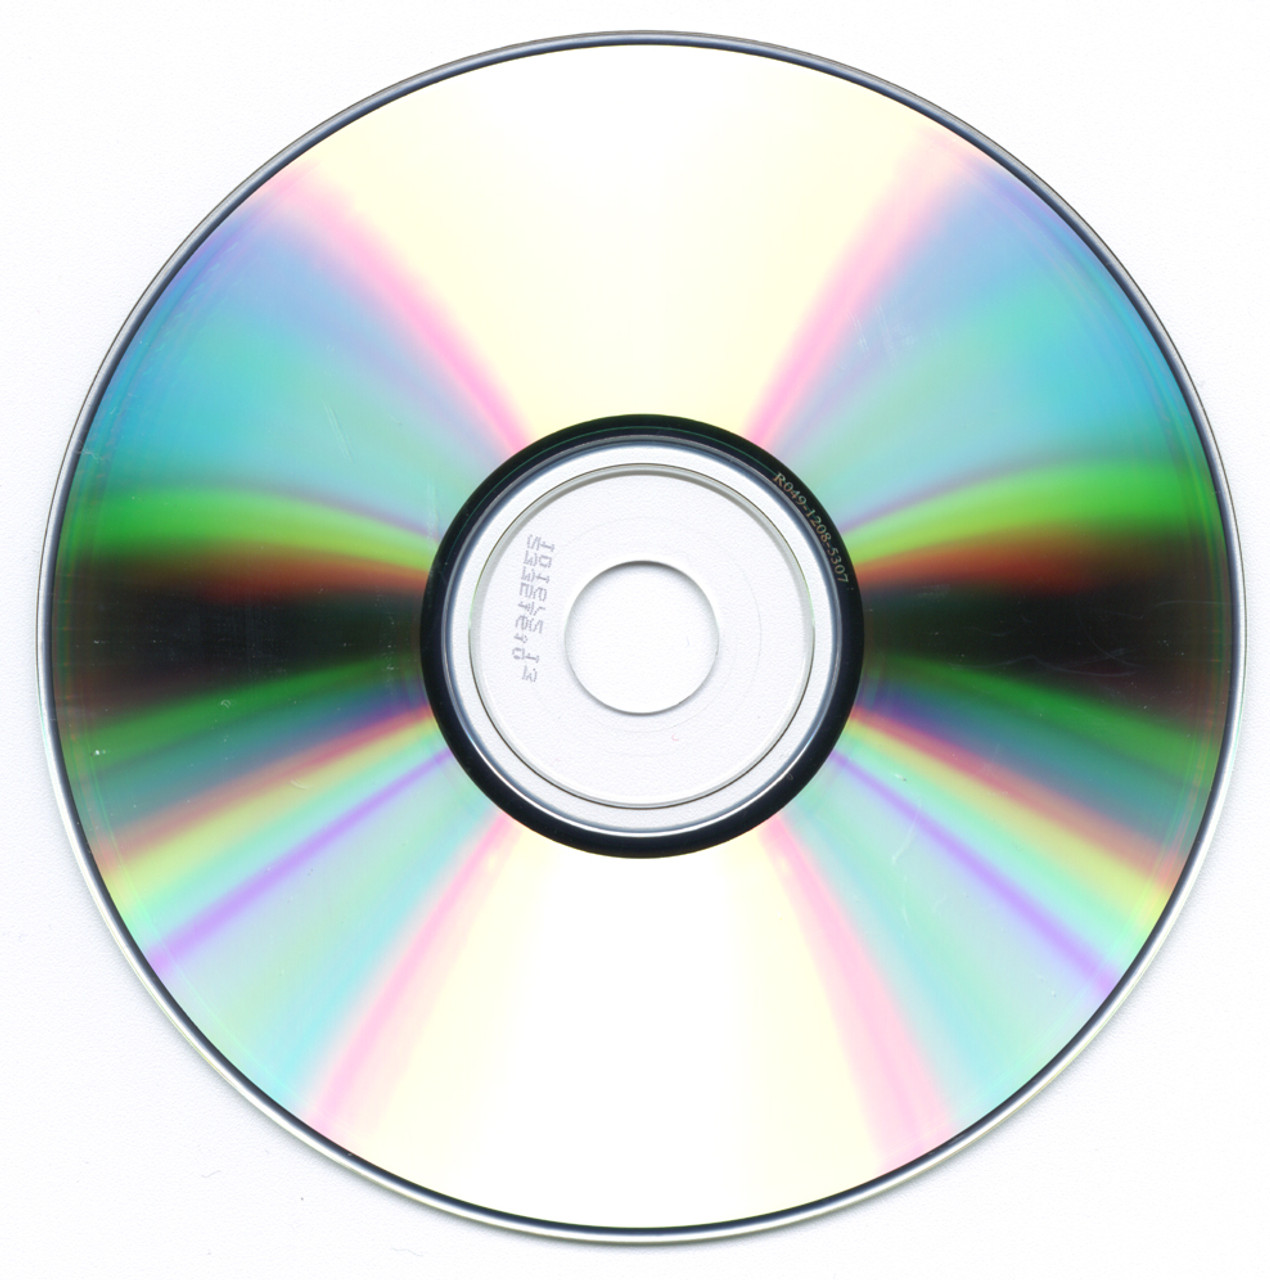 CAS LP1000N Software - Windows 8 & 10